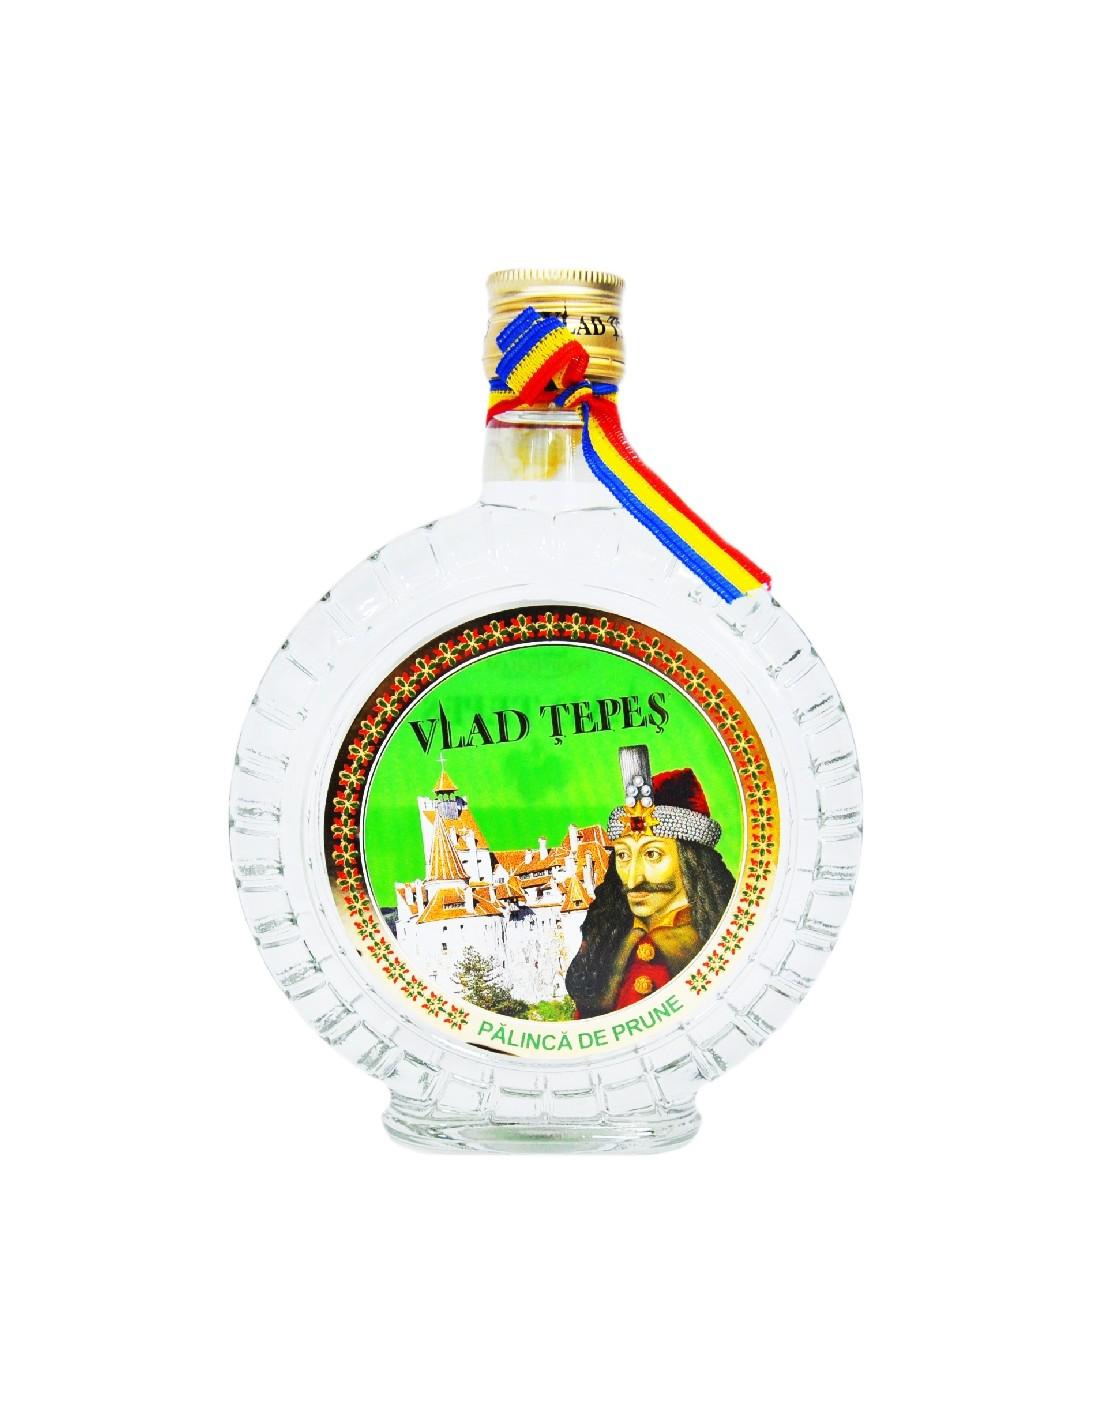 Palinca de prune Vlad Tepes, 40% alc., 0.35L, Romania